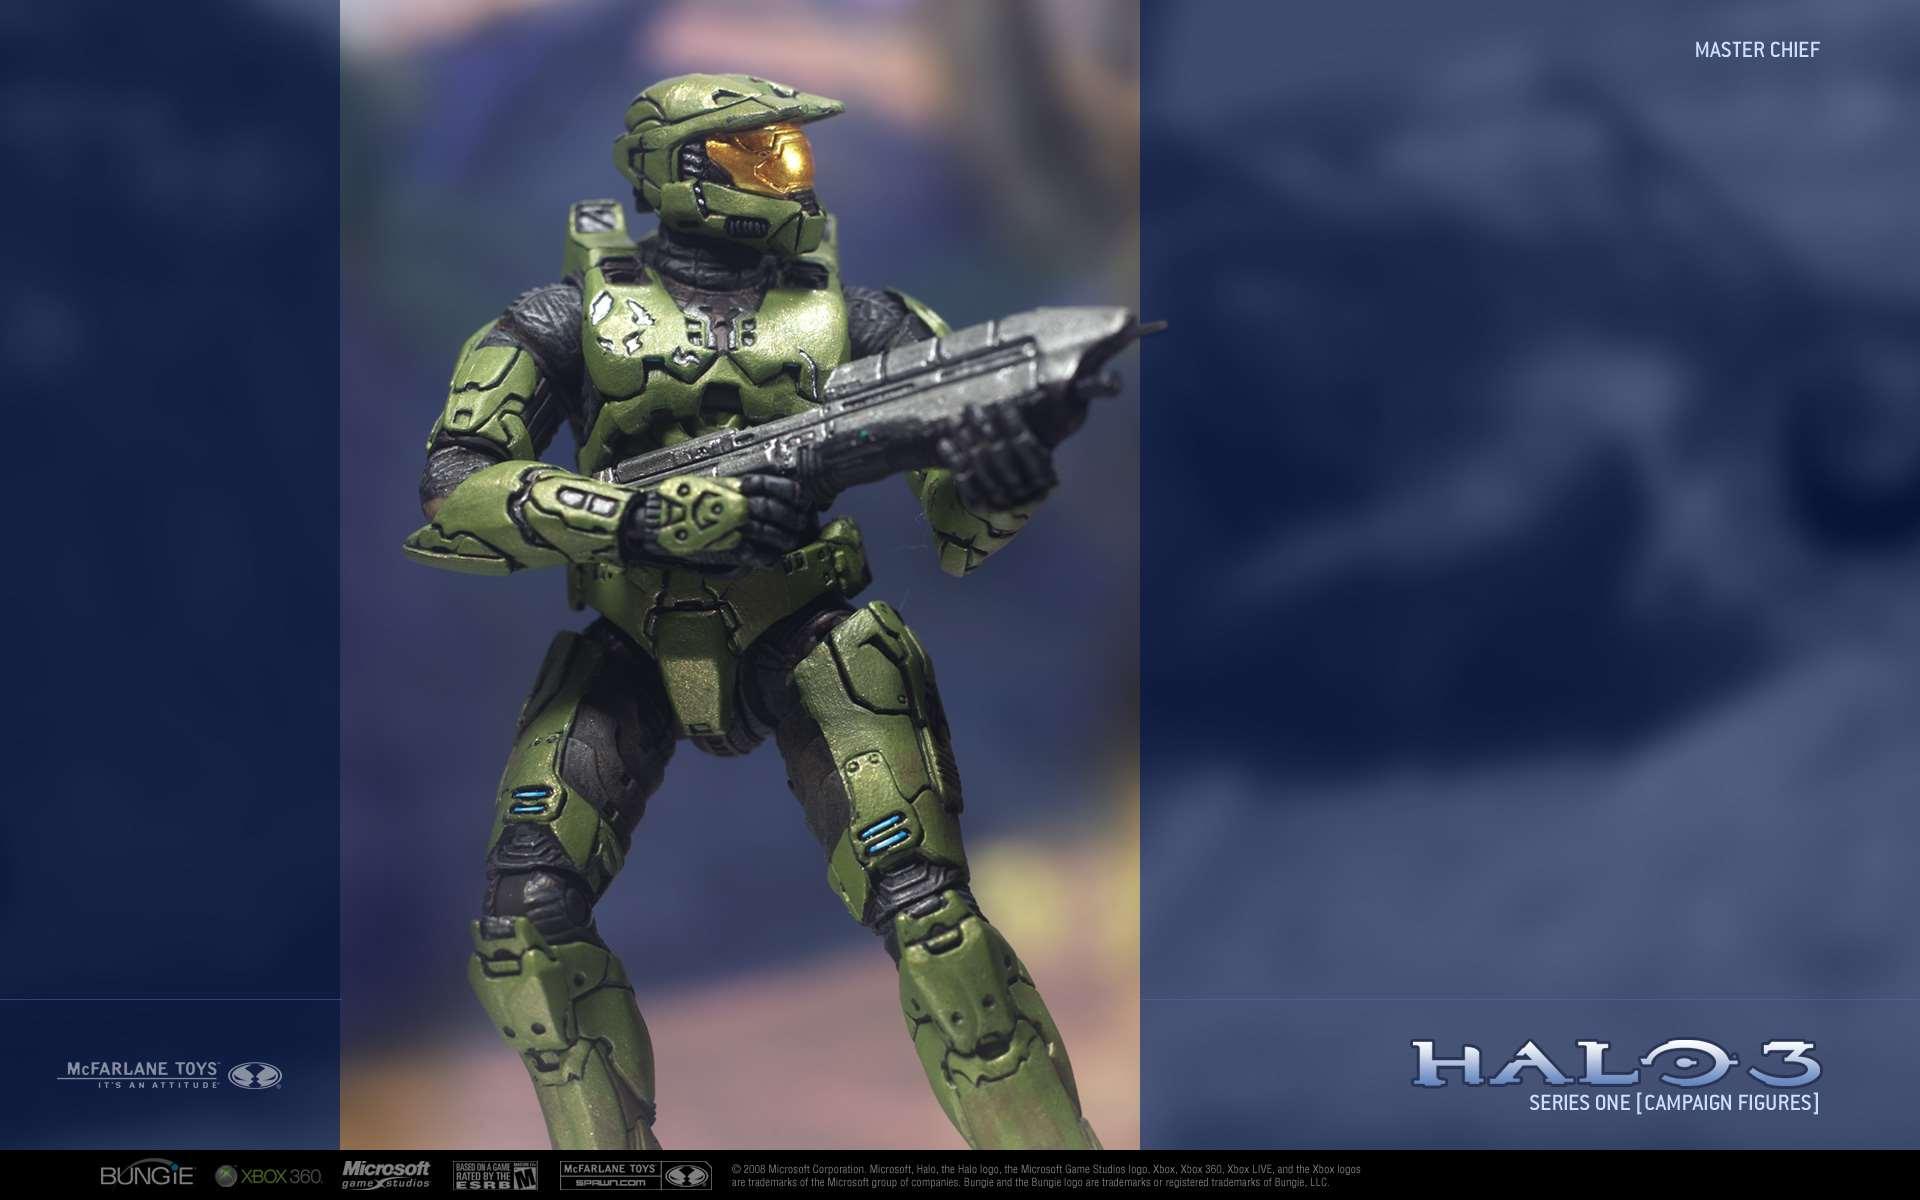 3 Halo 3 Series 1 Master Chief Wallpaper Wallpaper 3 Halo 3